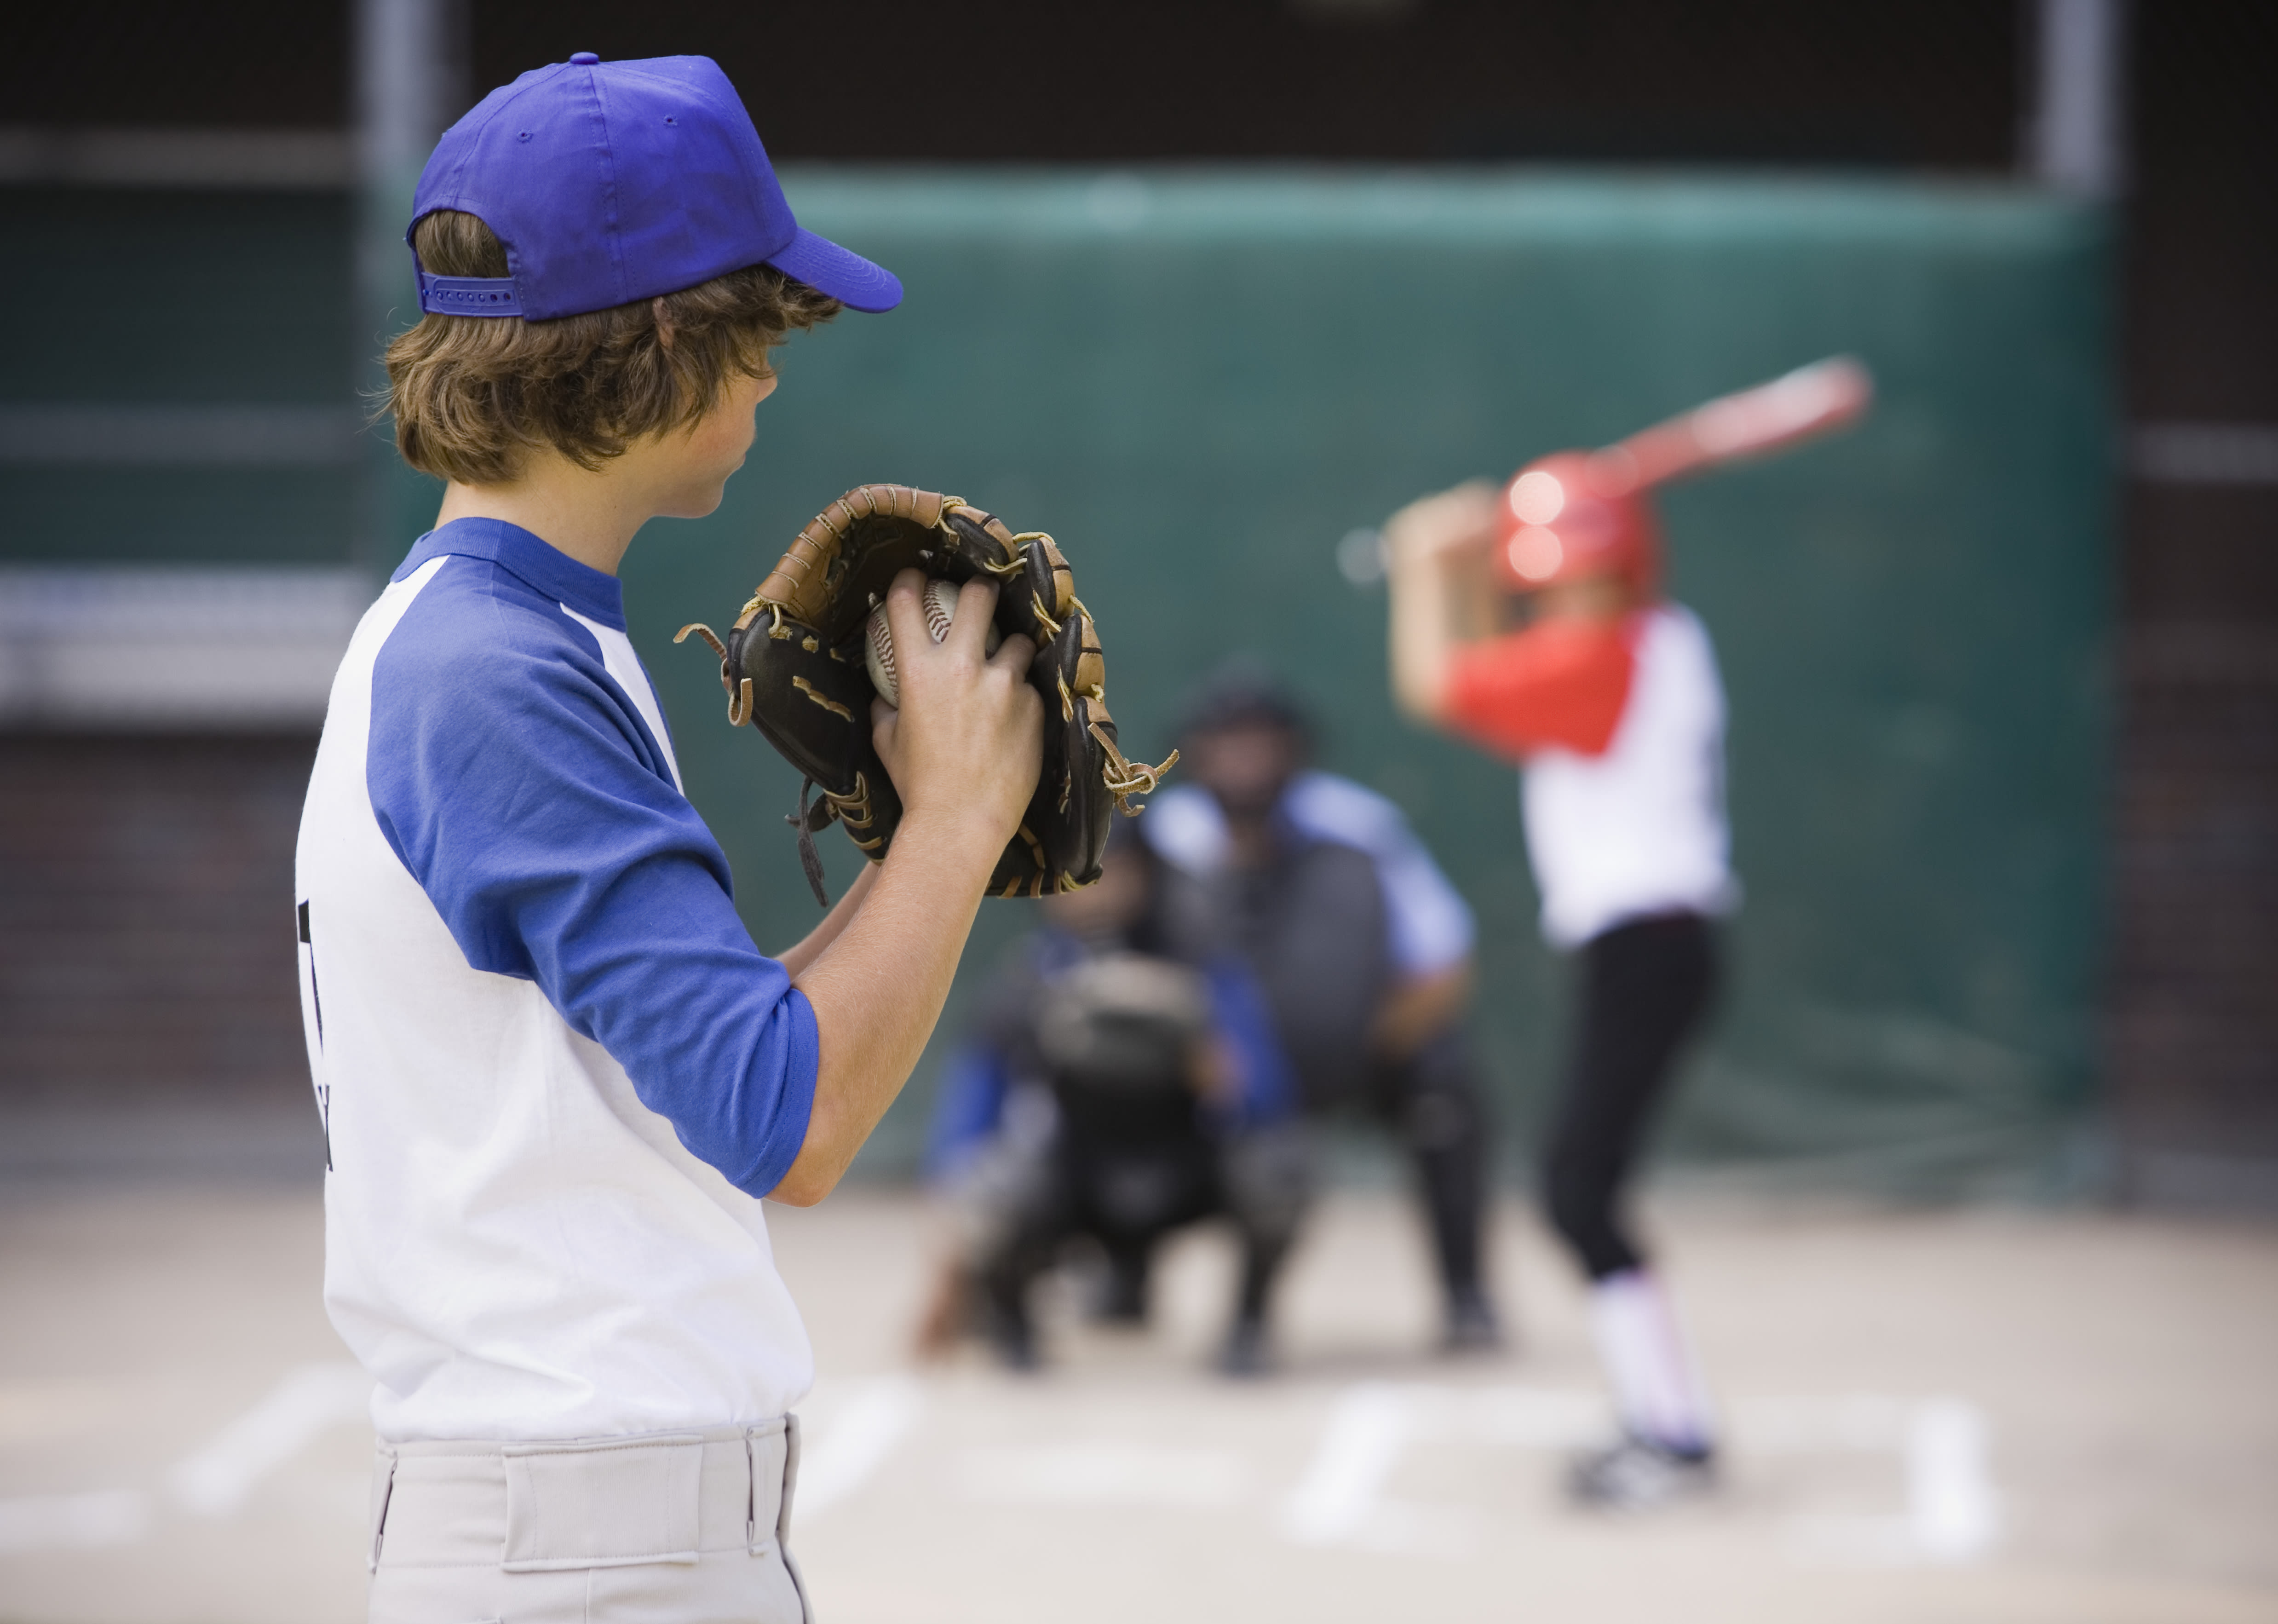 pitcher facing batter